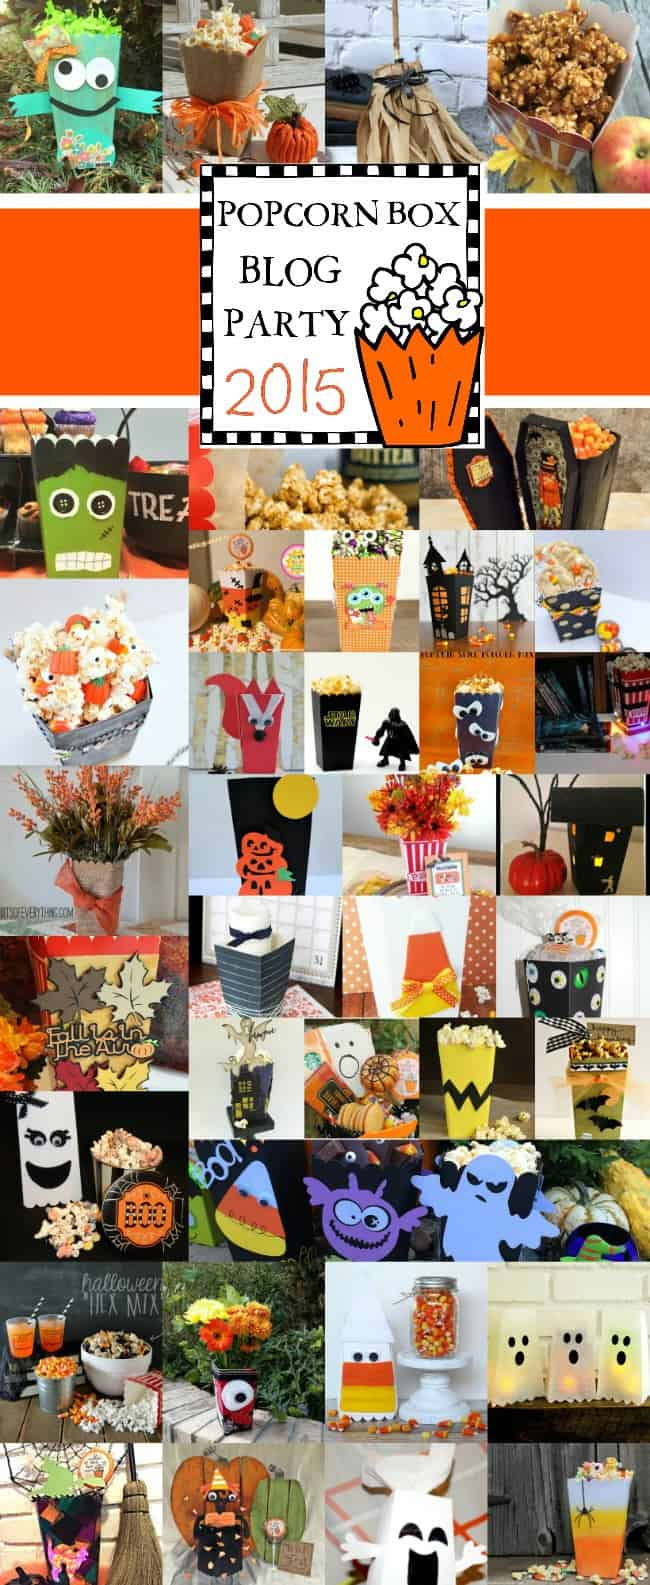 PopcornBox_Party_2015_Collage